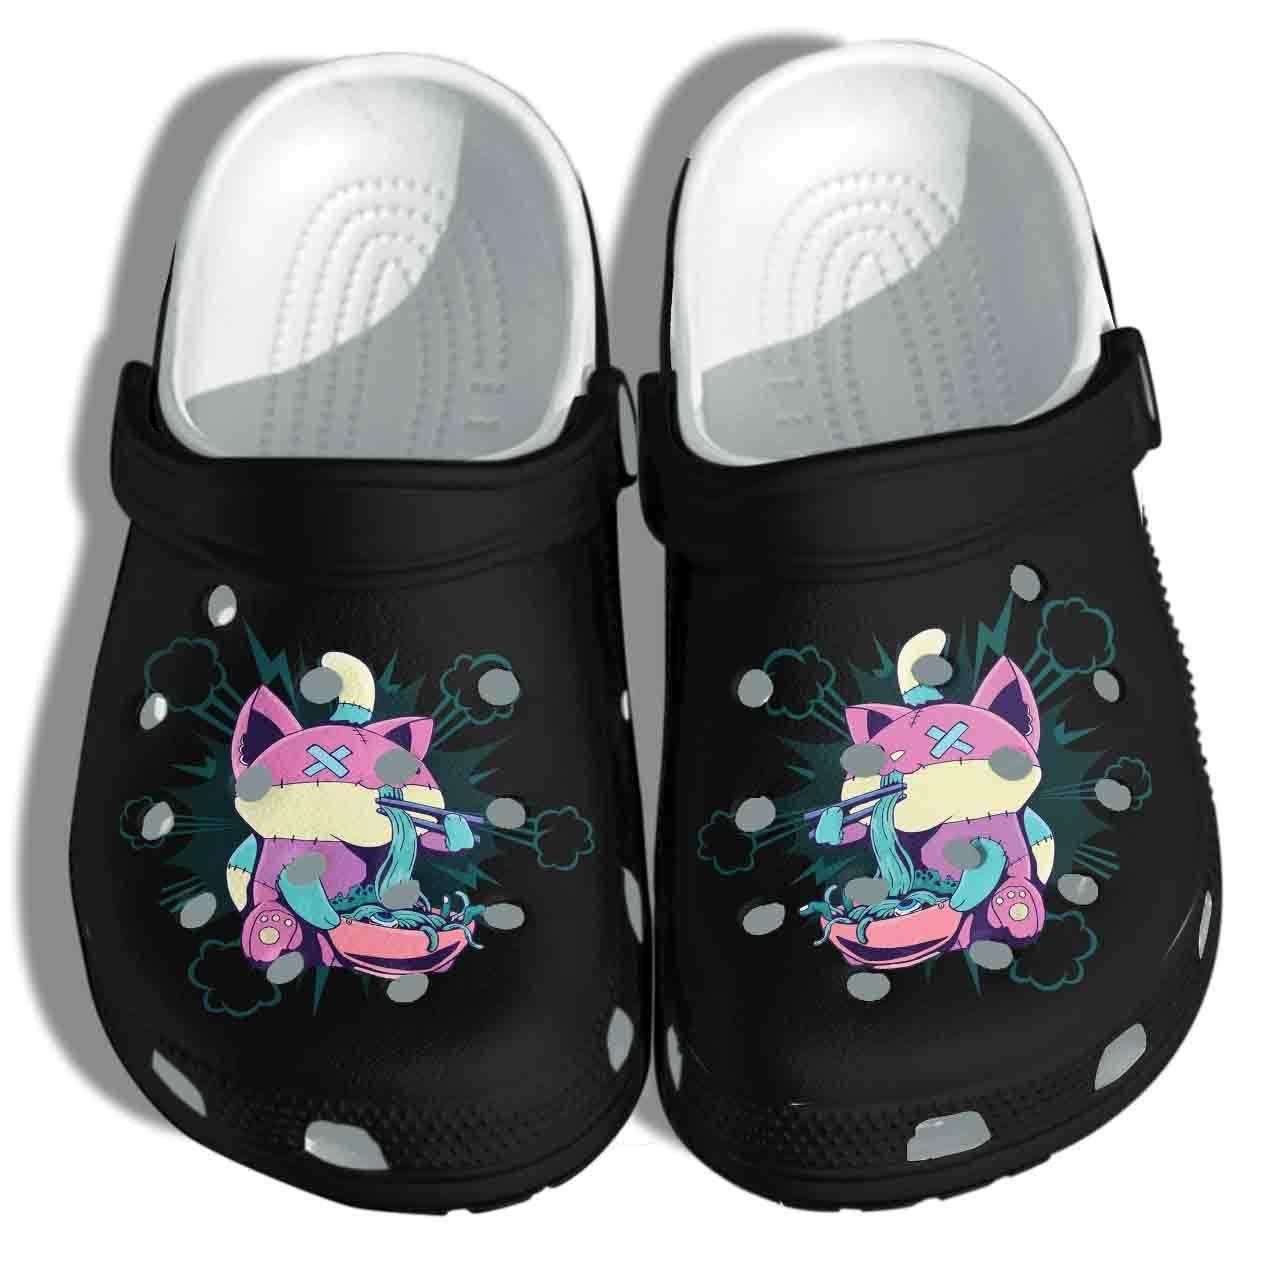 Photo of Pastel Goth Ramen Cat Crocs Shoes – Anime Kawaii Crocs Clog Birthday Gift For Girl Daughter Niece